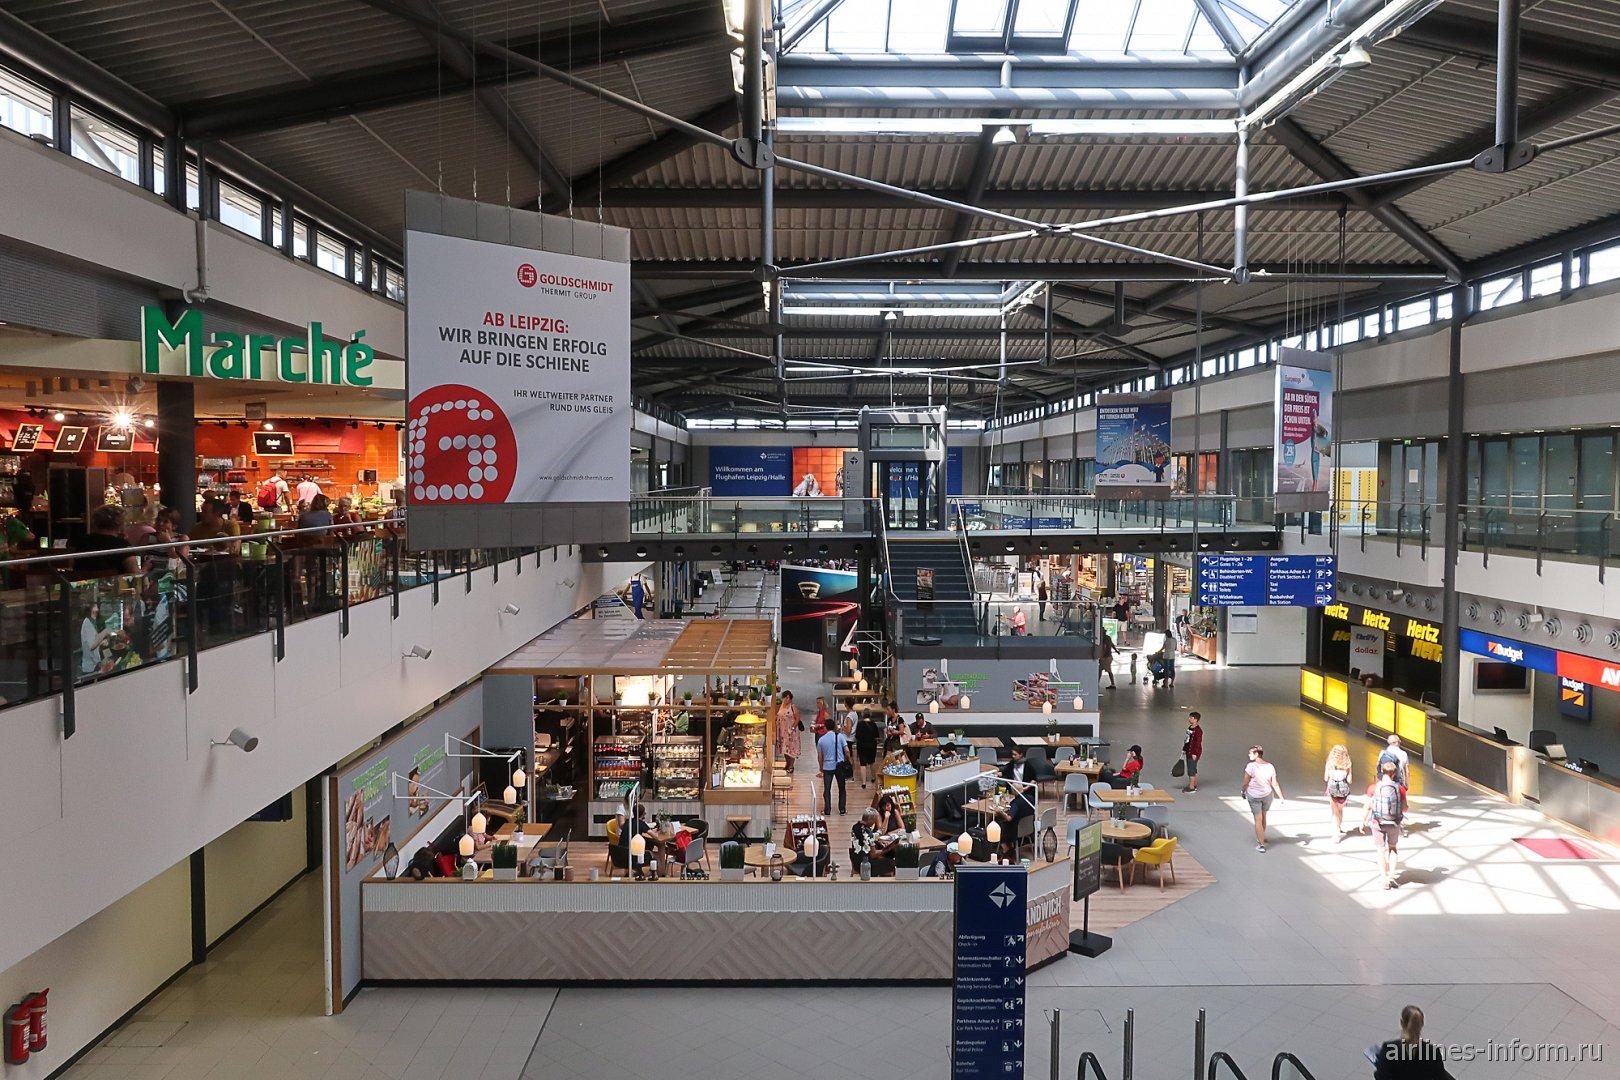 Зона прилета в терминале B аэропорта Лейпциг-Галле